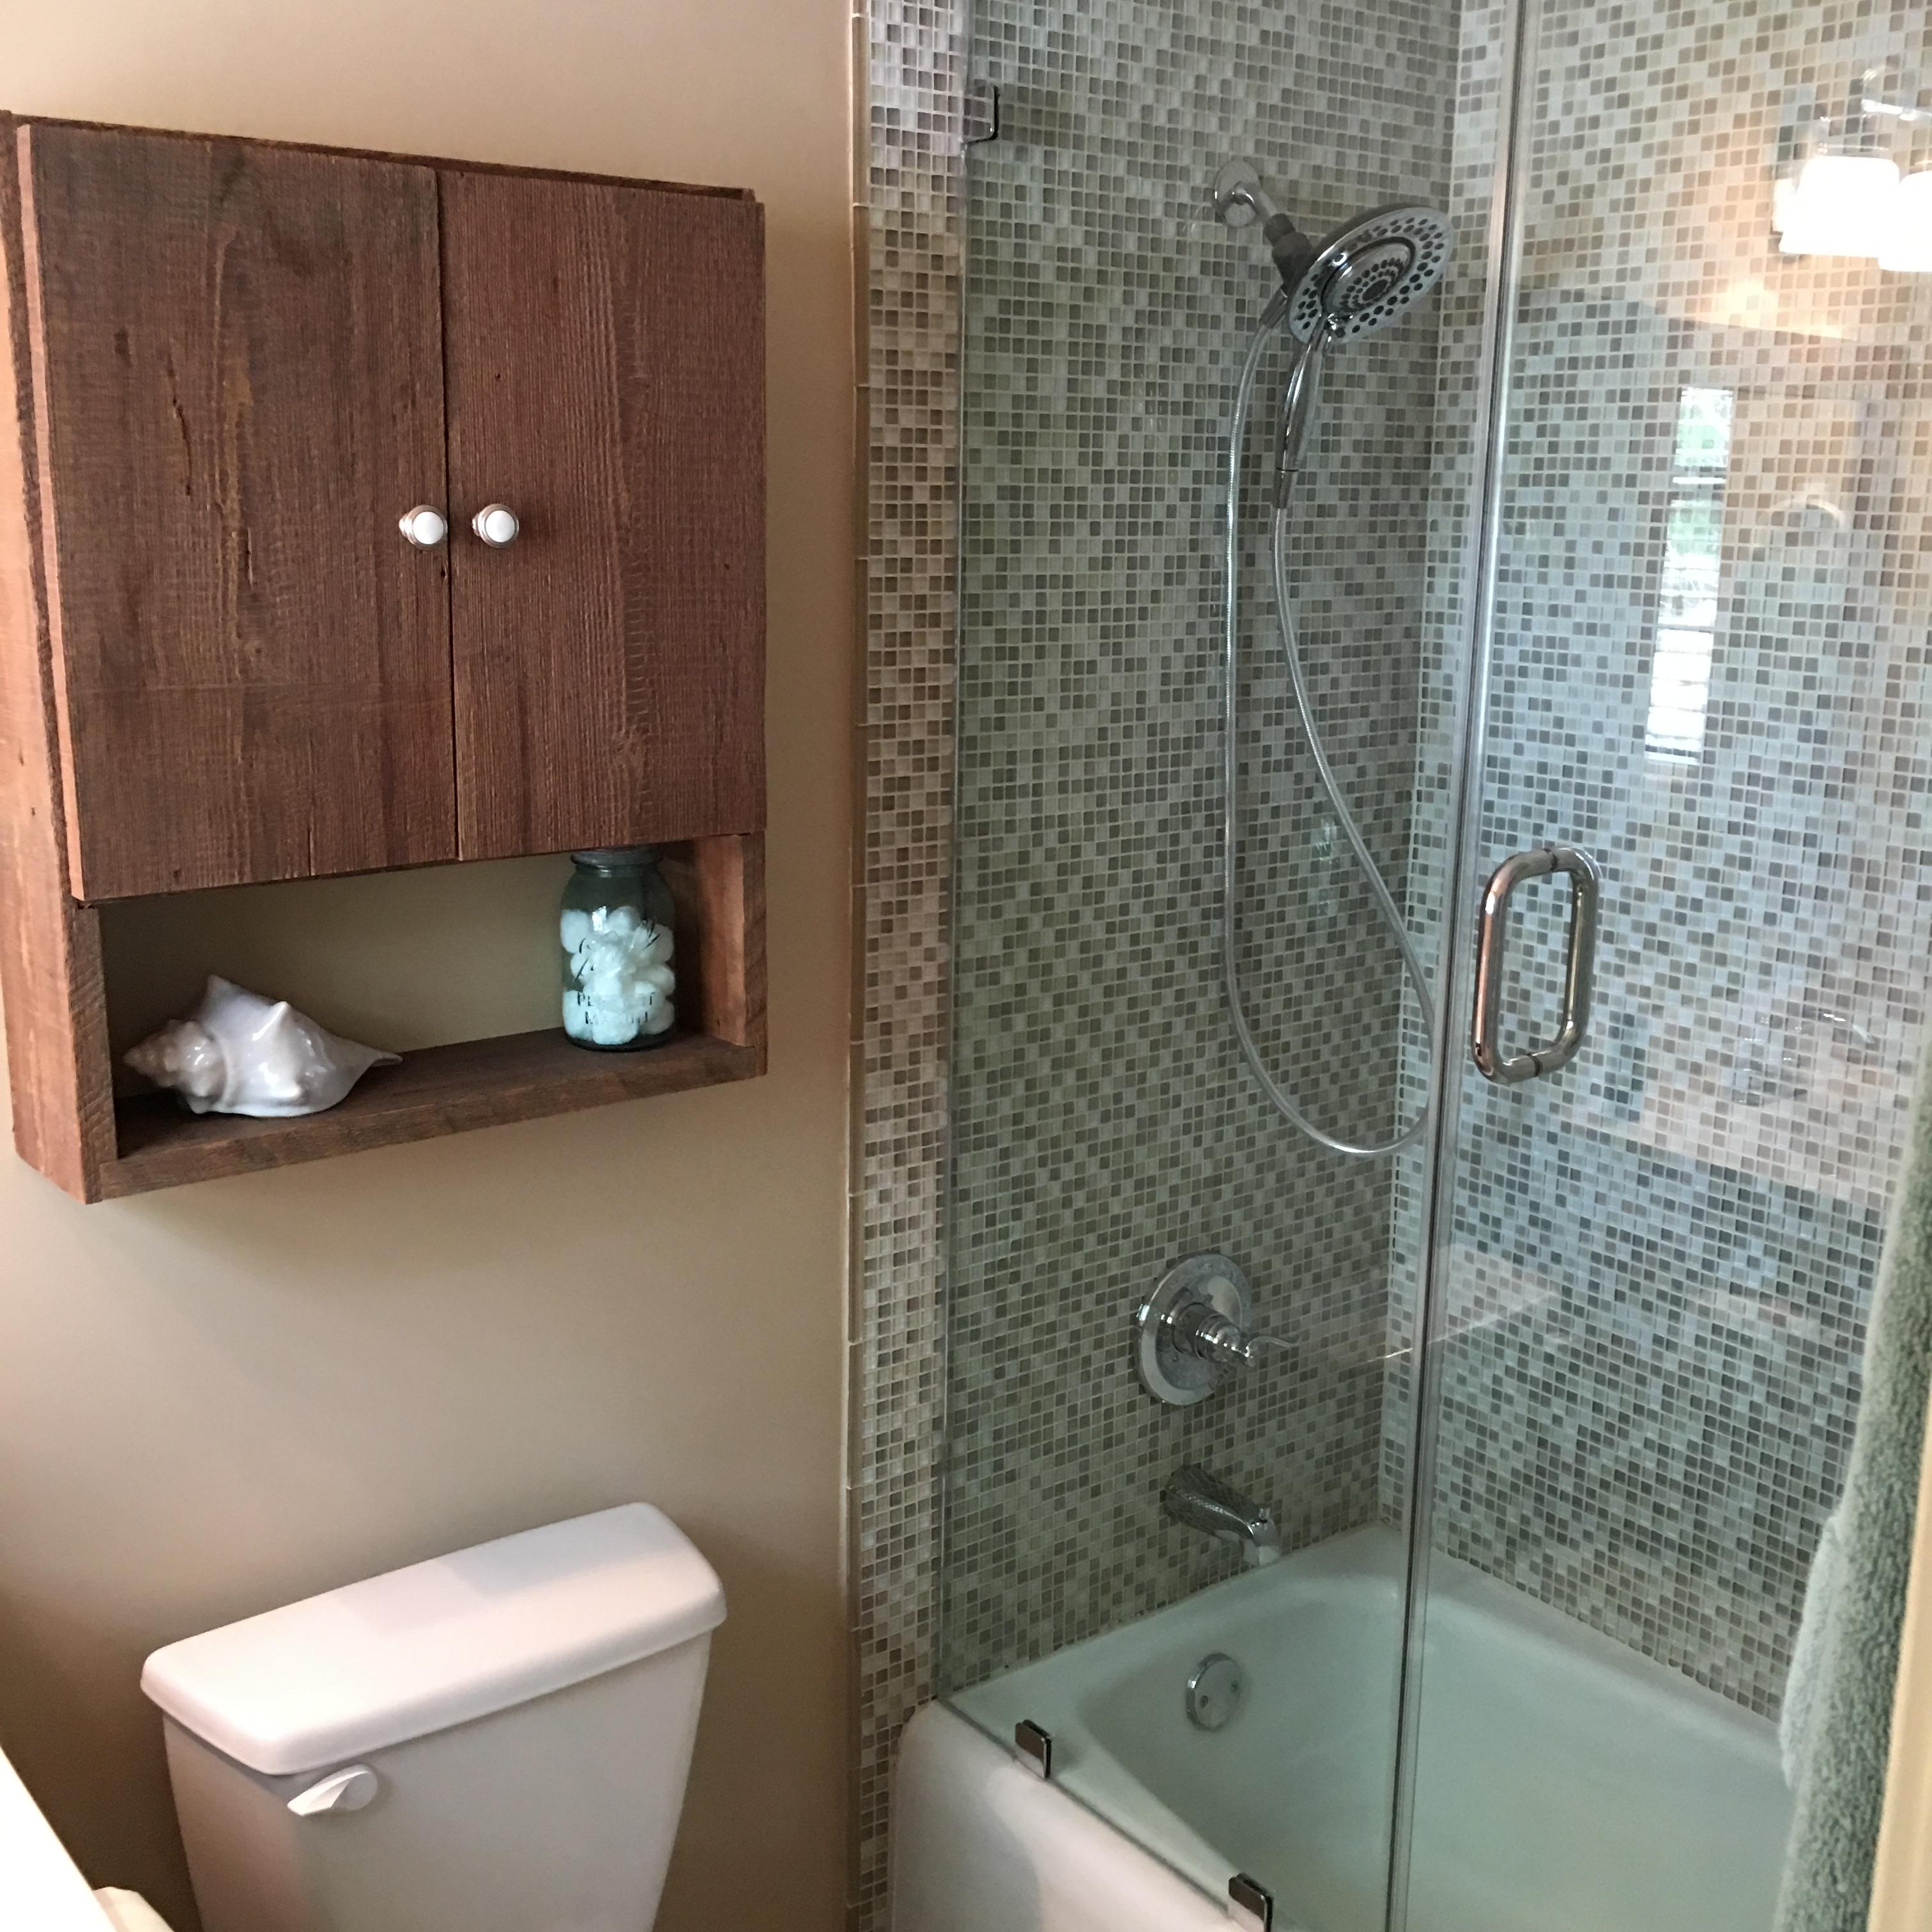 Bathroom Remodeling Fairhope AL Days Home Improvement - Bathroom remodel mobile al